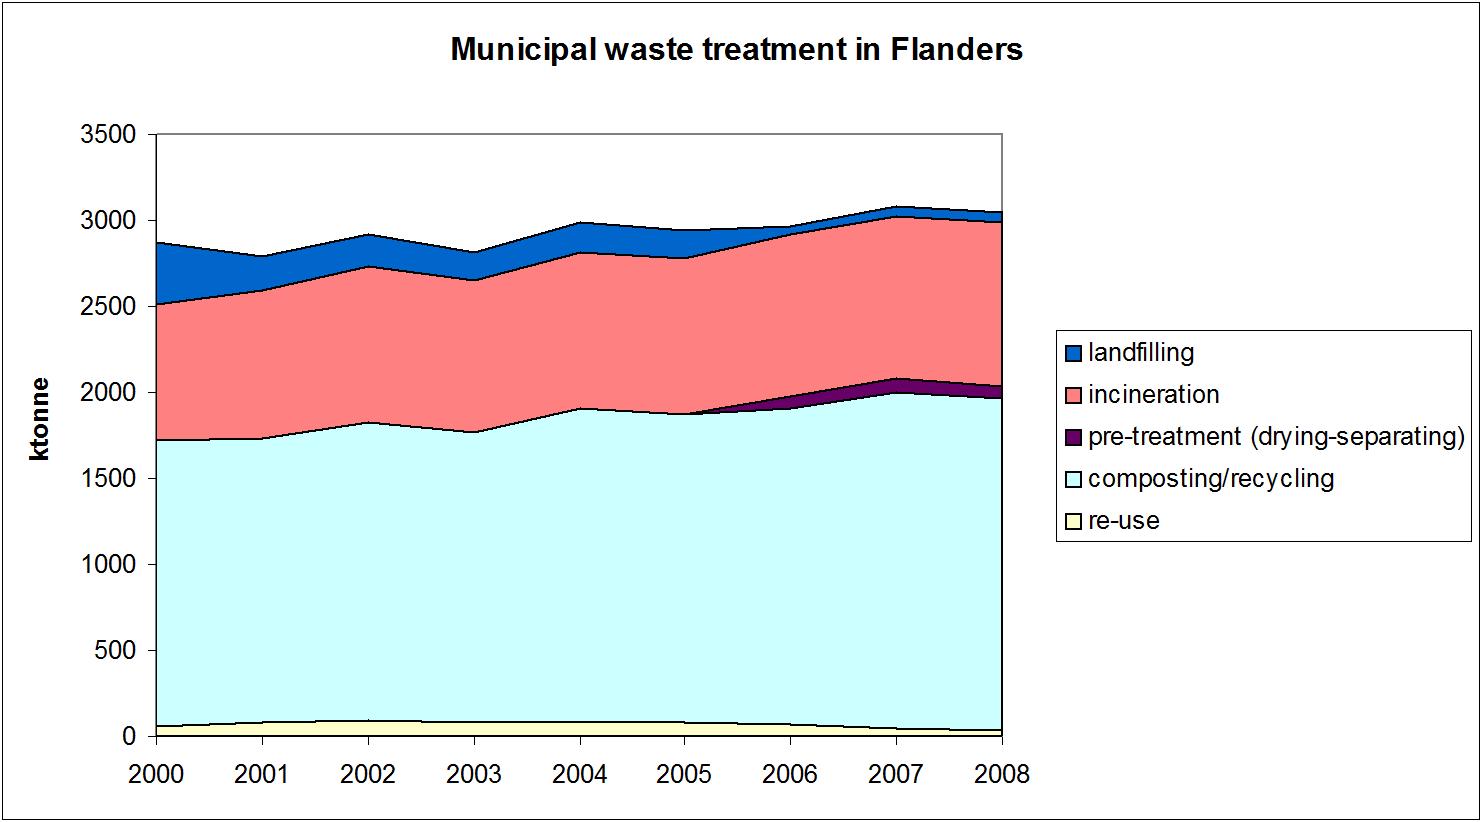 Figure 1: Municipal waste treatment in the Flemish Region